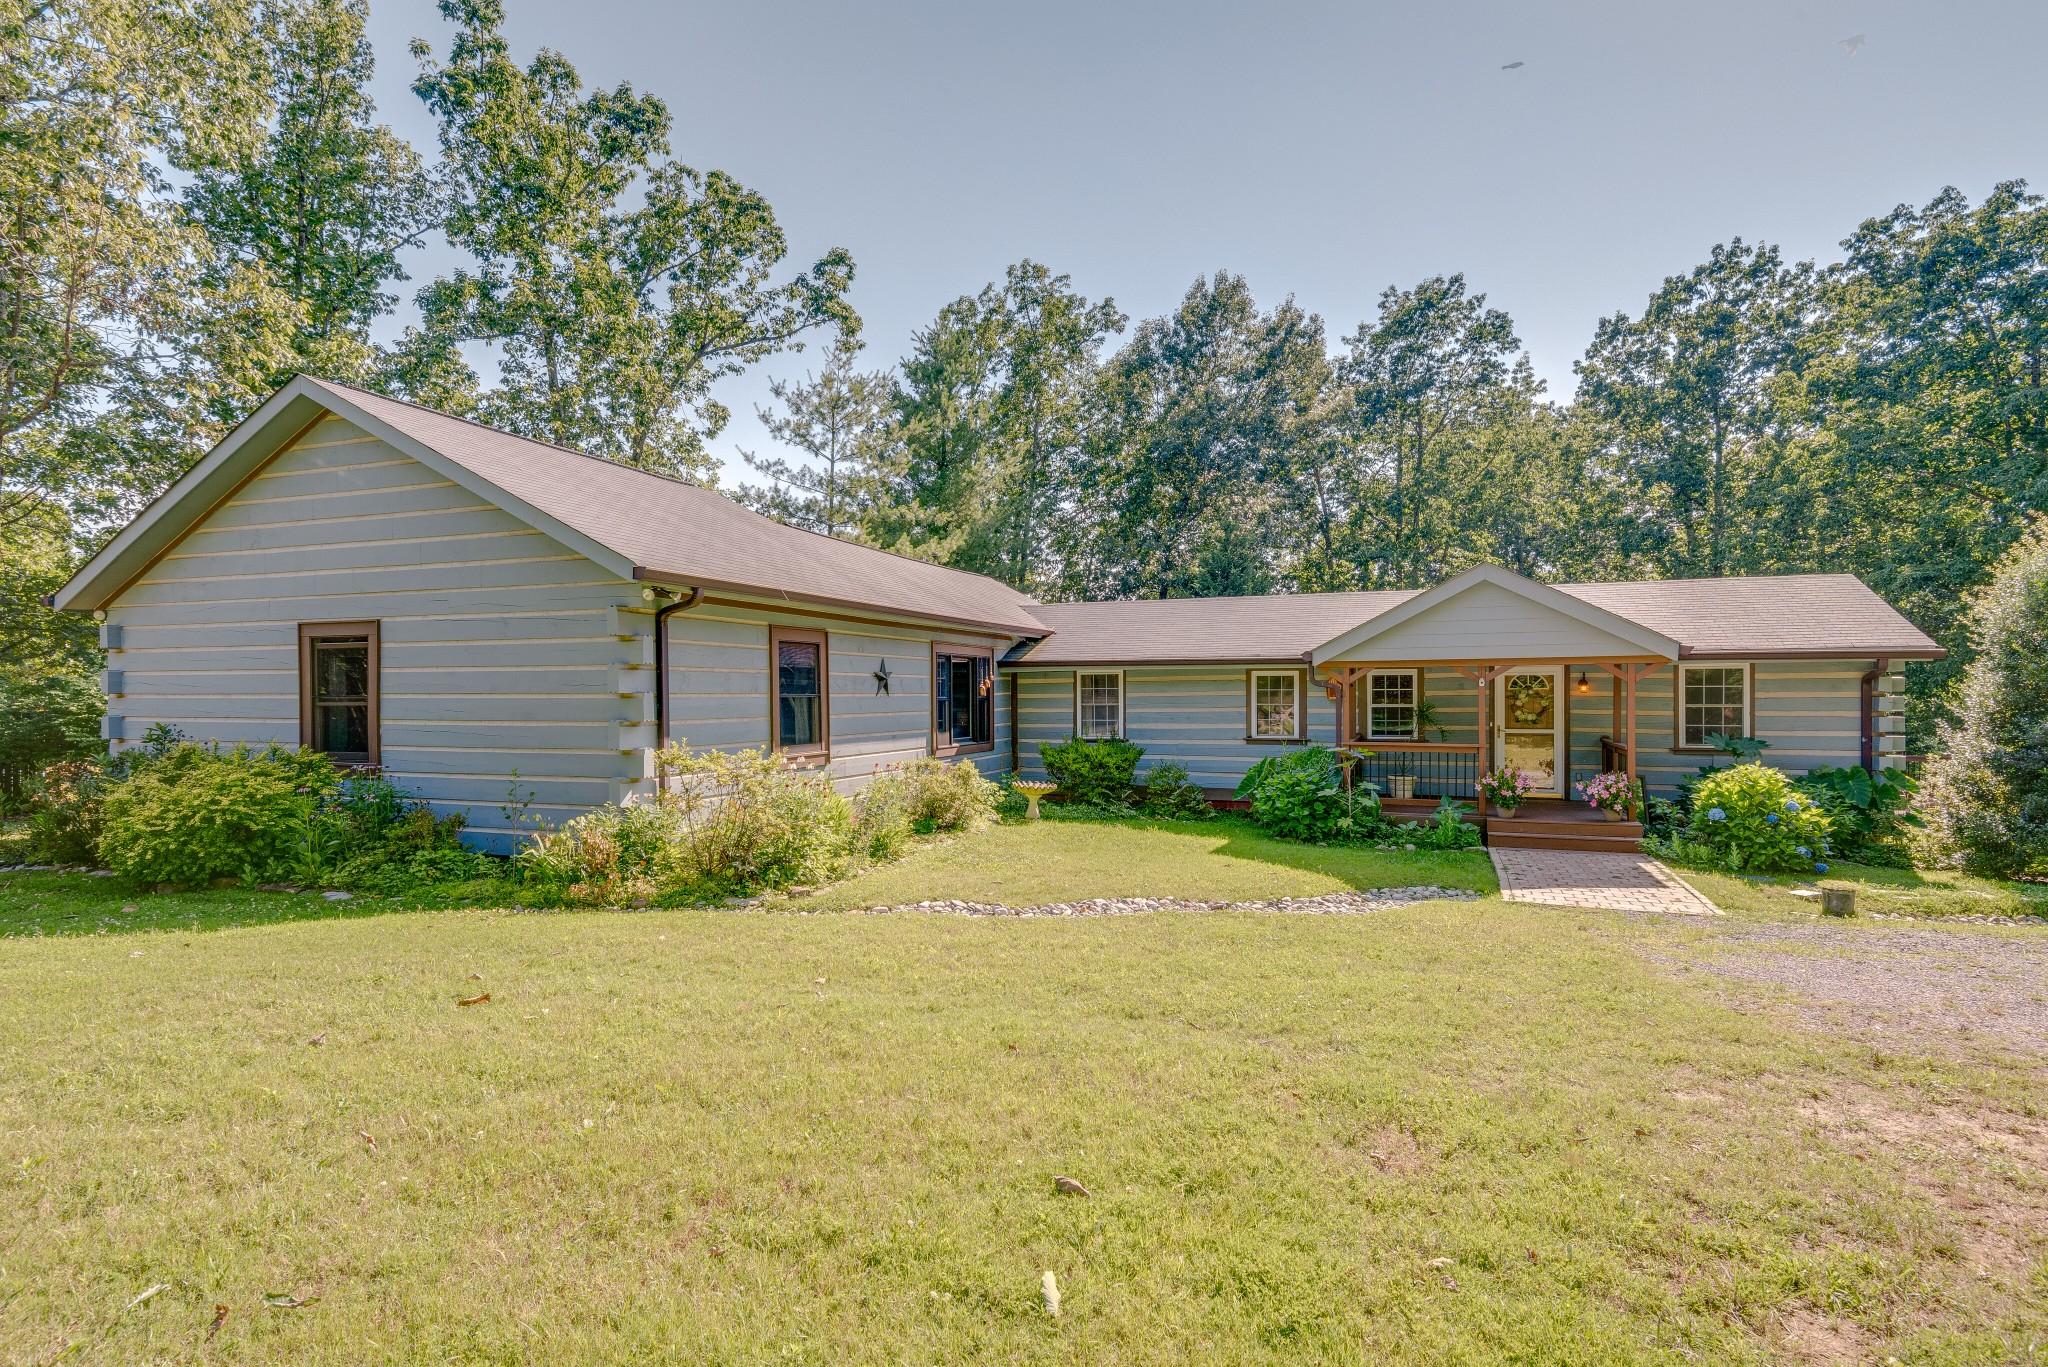 5298 Old Sams Creek Rd Property Photo - Pegram, TN real estate listing